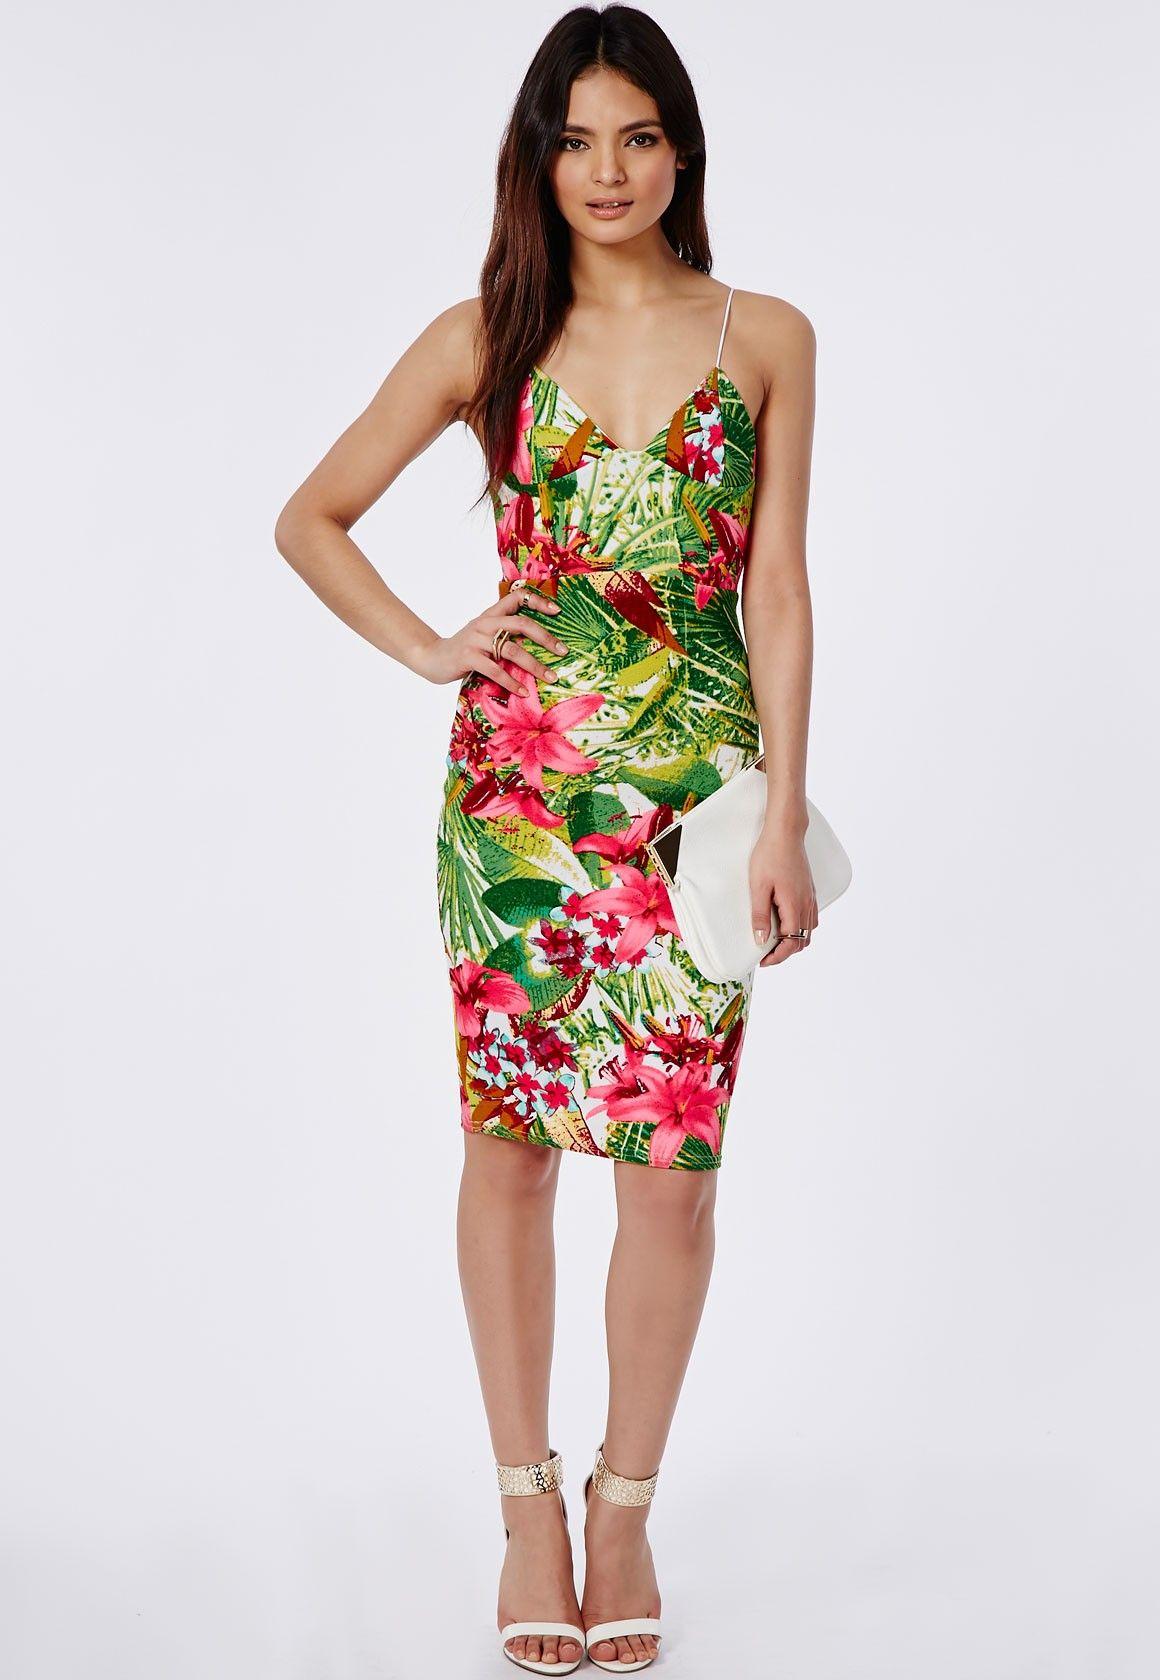 d59736de450486 Mardella Tropical Print Strappy Midi Dress - Dresses - Midi Dresses -  Missguided